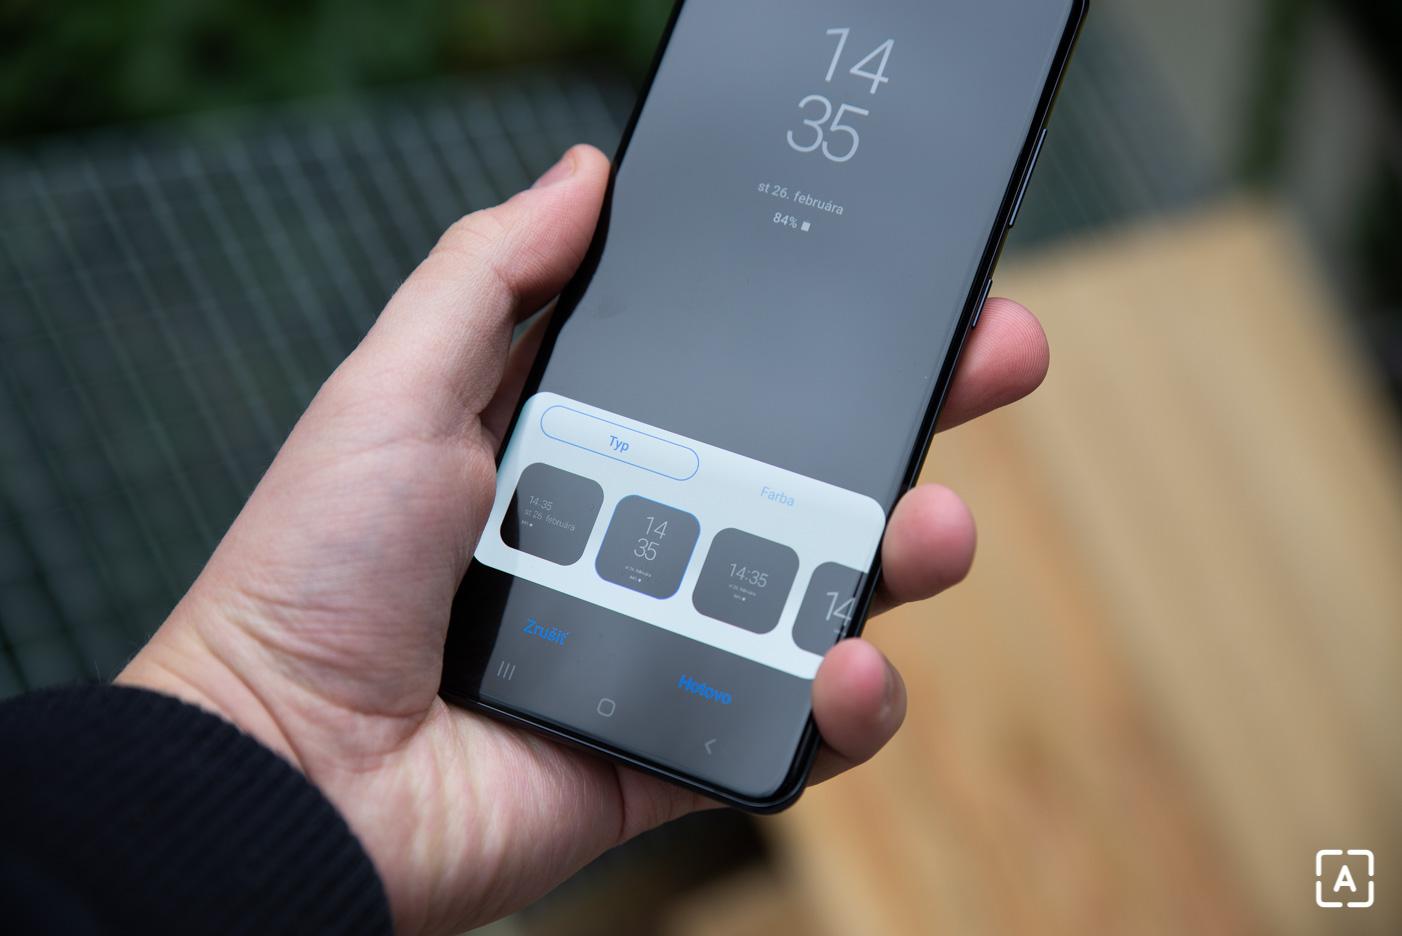 Samsung Galaxy S20 Ultra always on